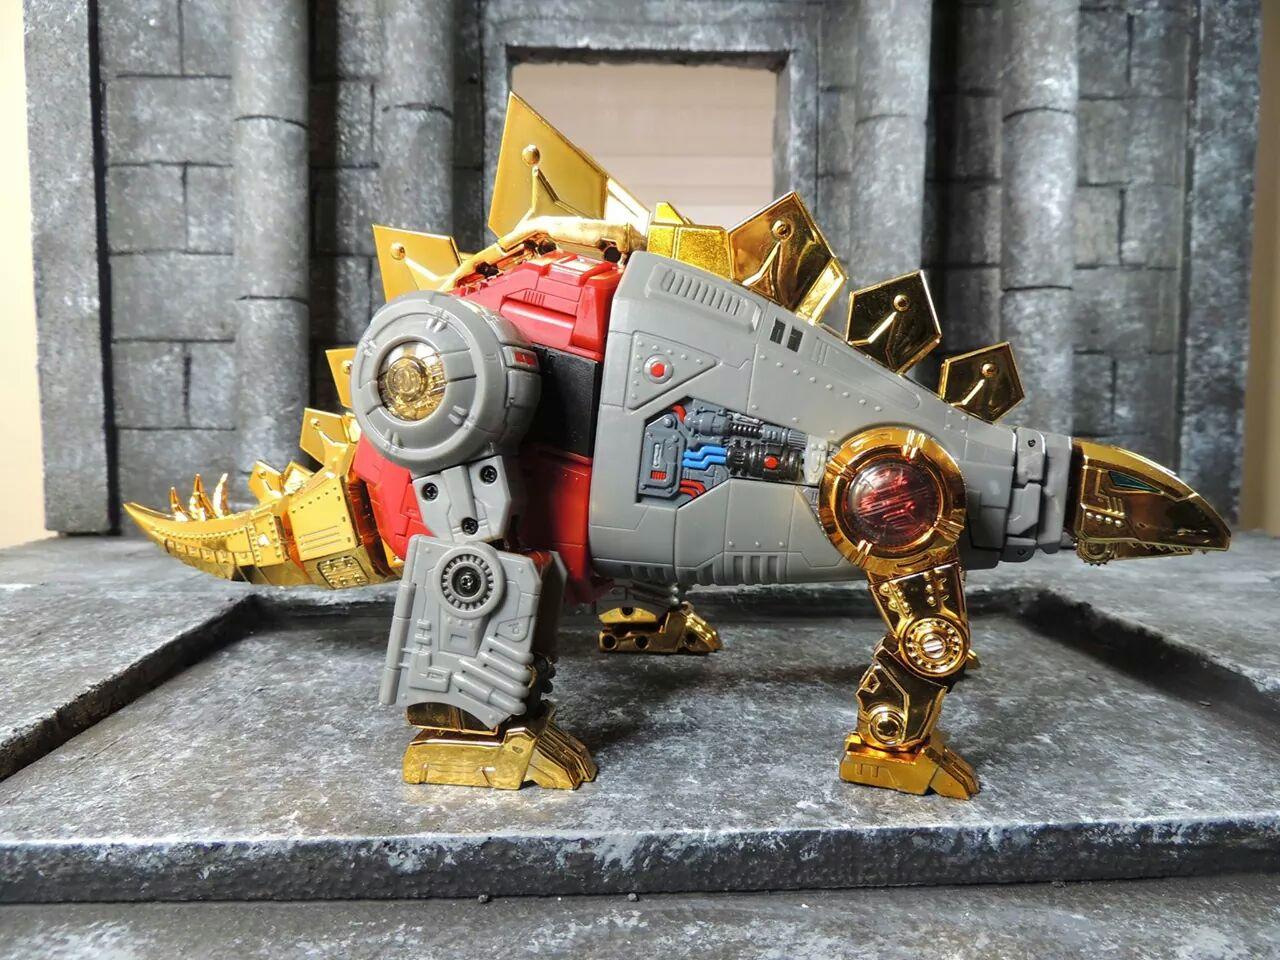 [Fanstoys] Produit Tiers - Dinobots - FT-04 Scoria, FT-05 Soar, FT-06 Sever, FT-07 Stomp, FT-08 Grinder - Page 4 Re7c4wSx